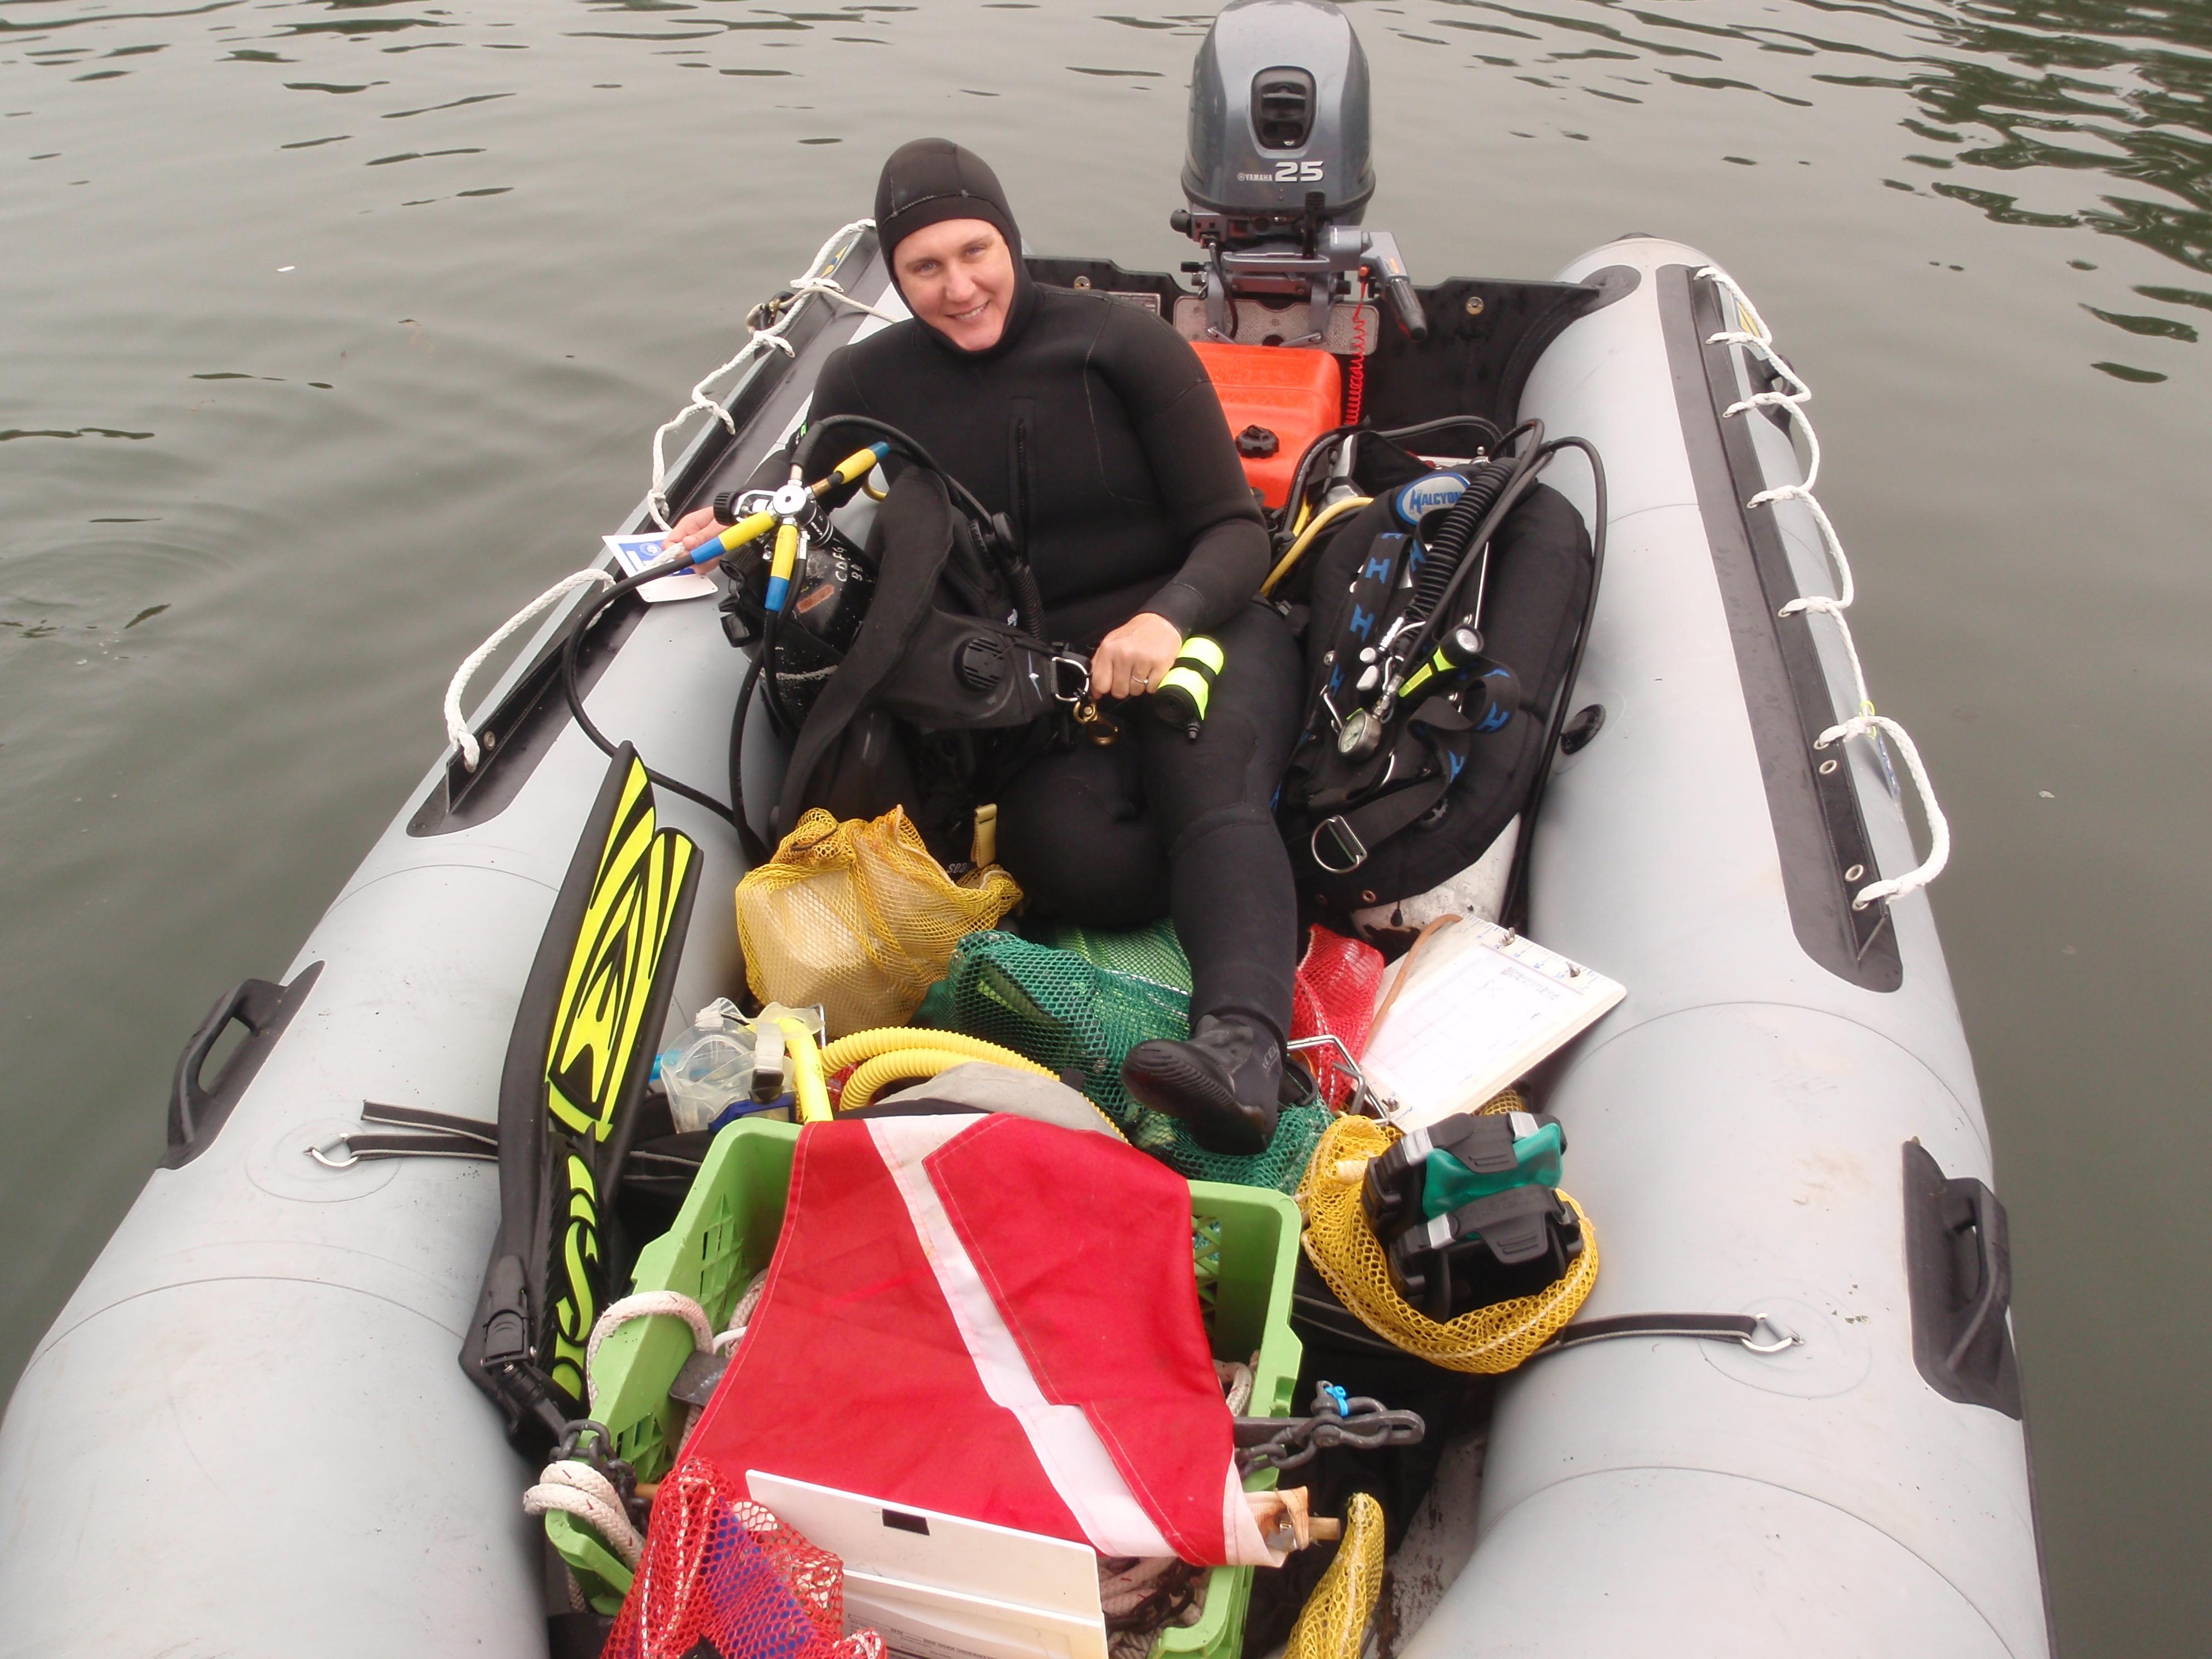 Researcher siting in boat full of scuba dive gear